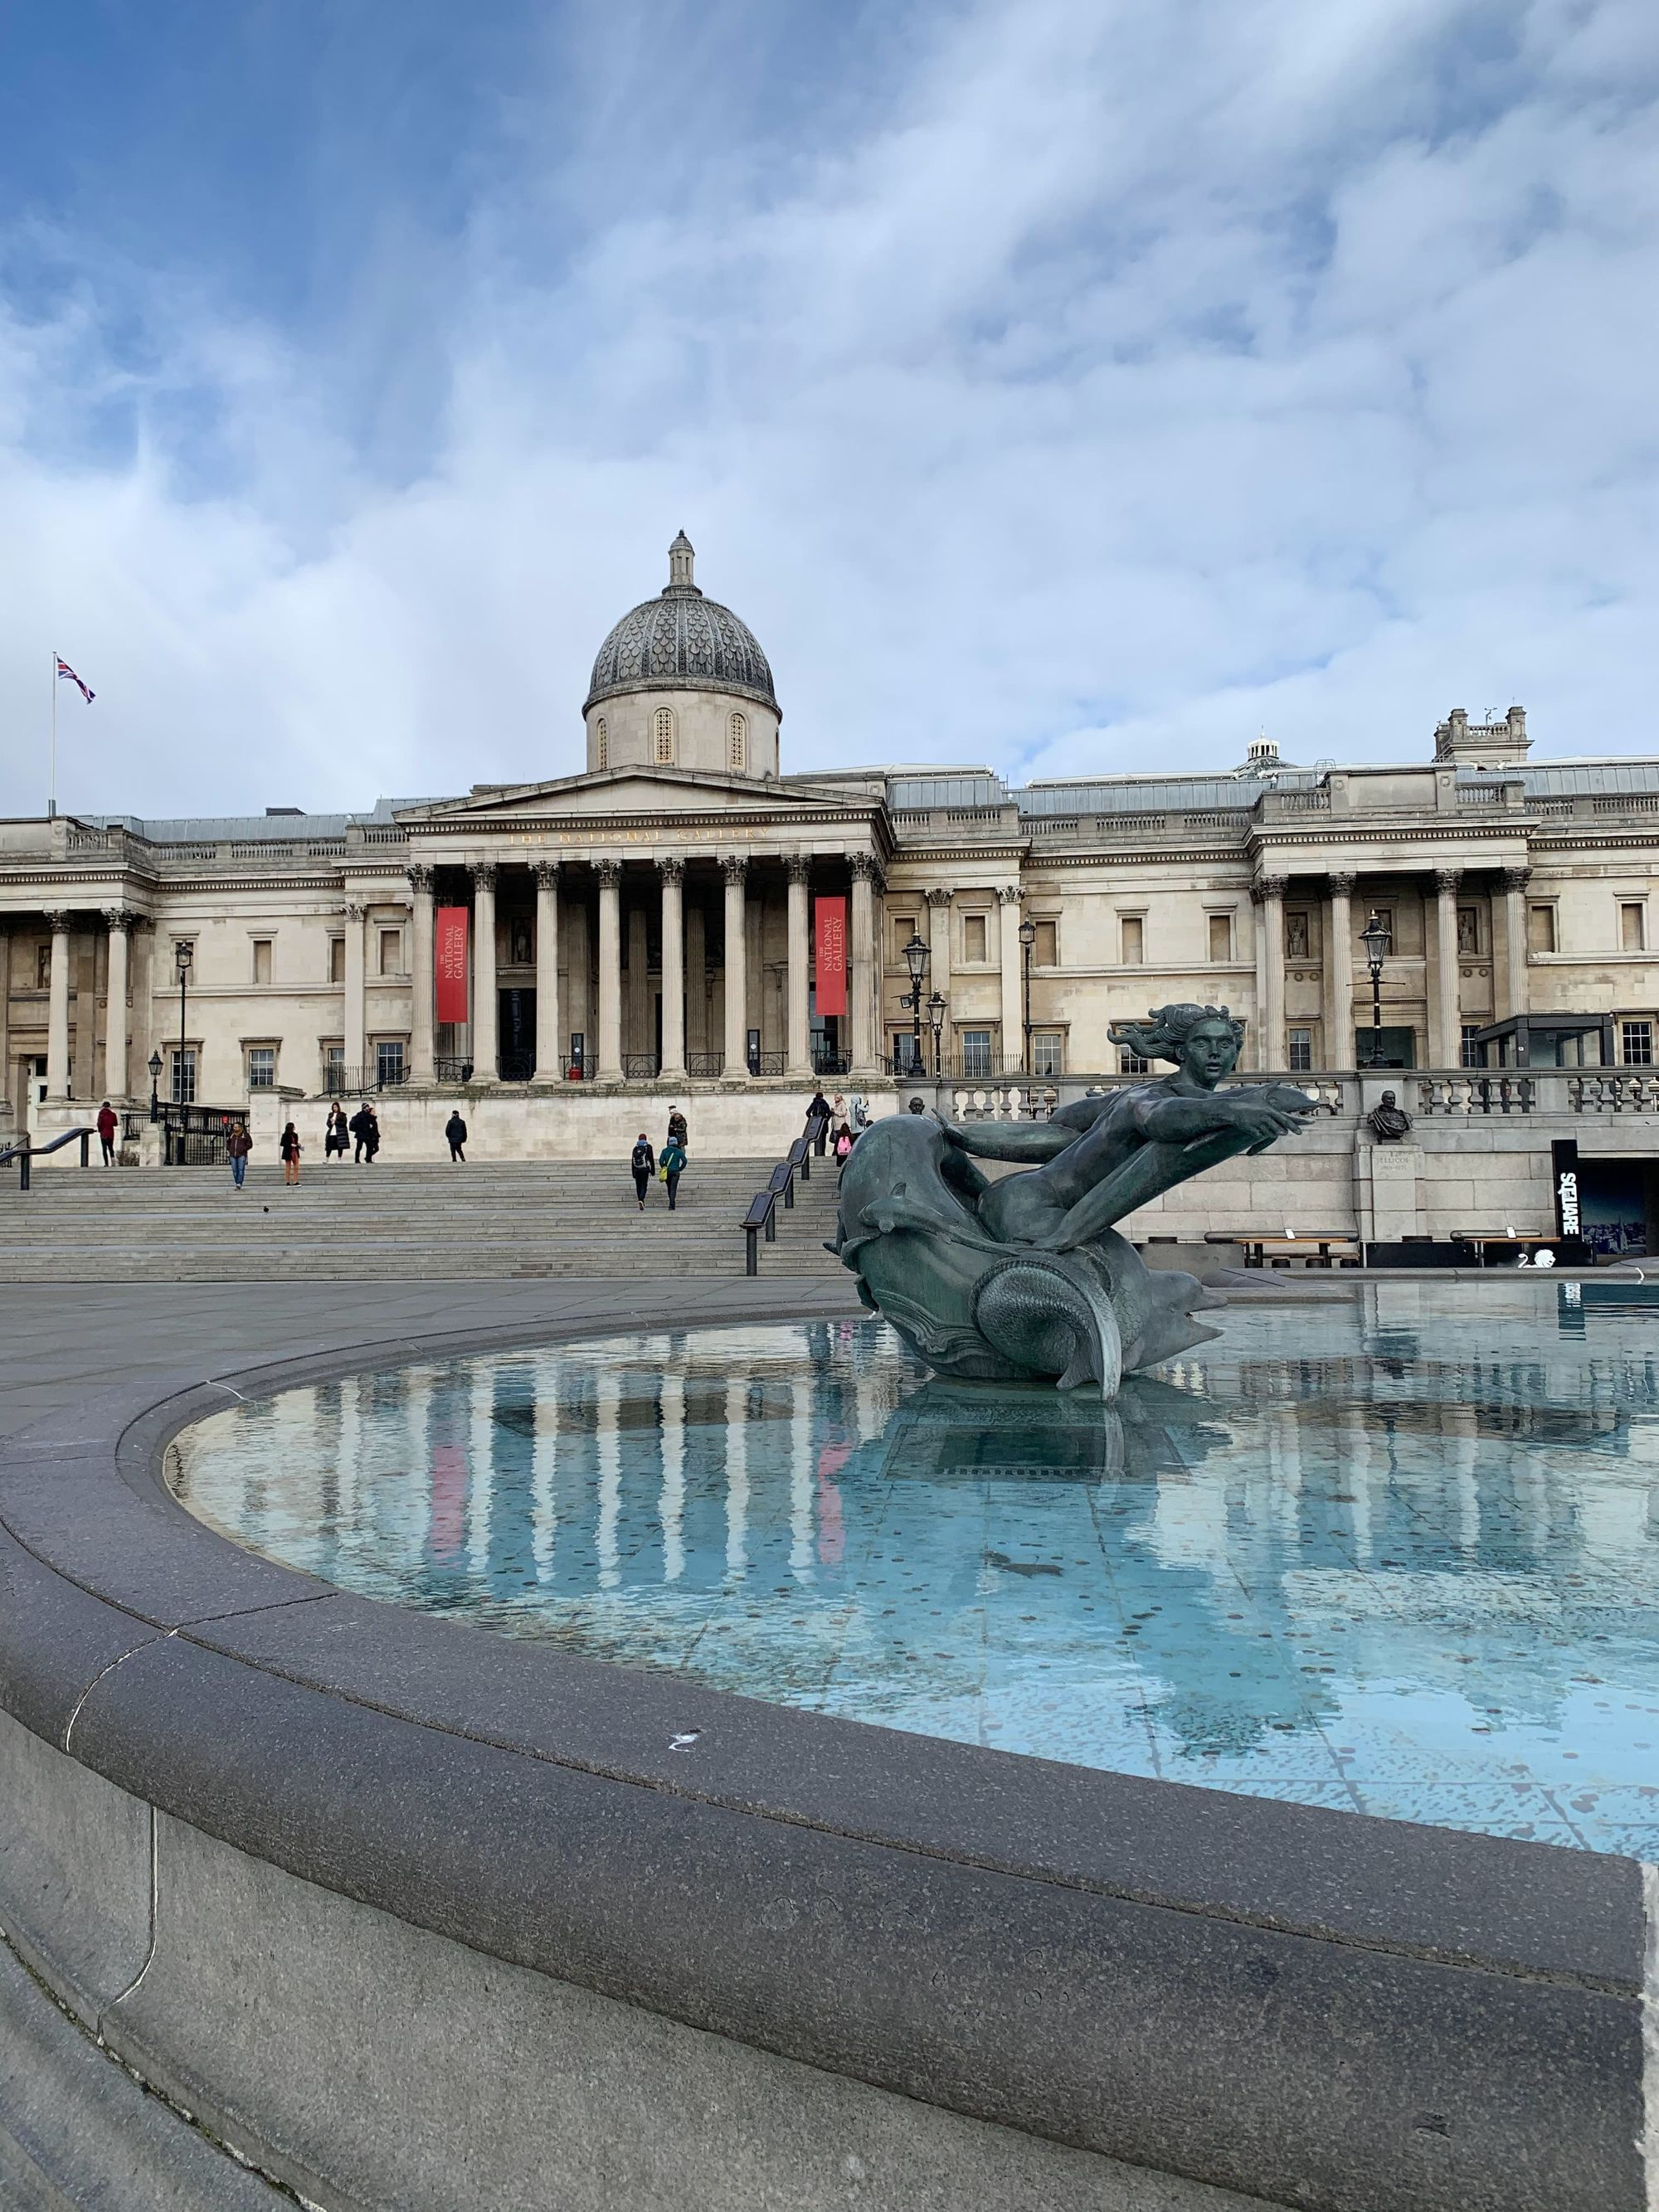 Trafalgar Square film location